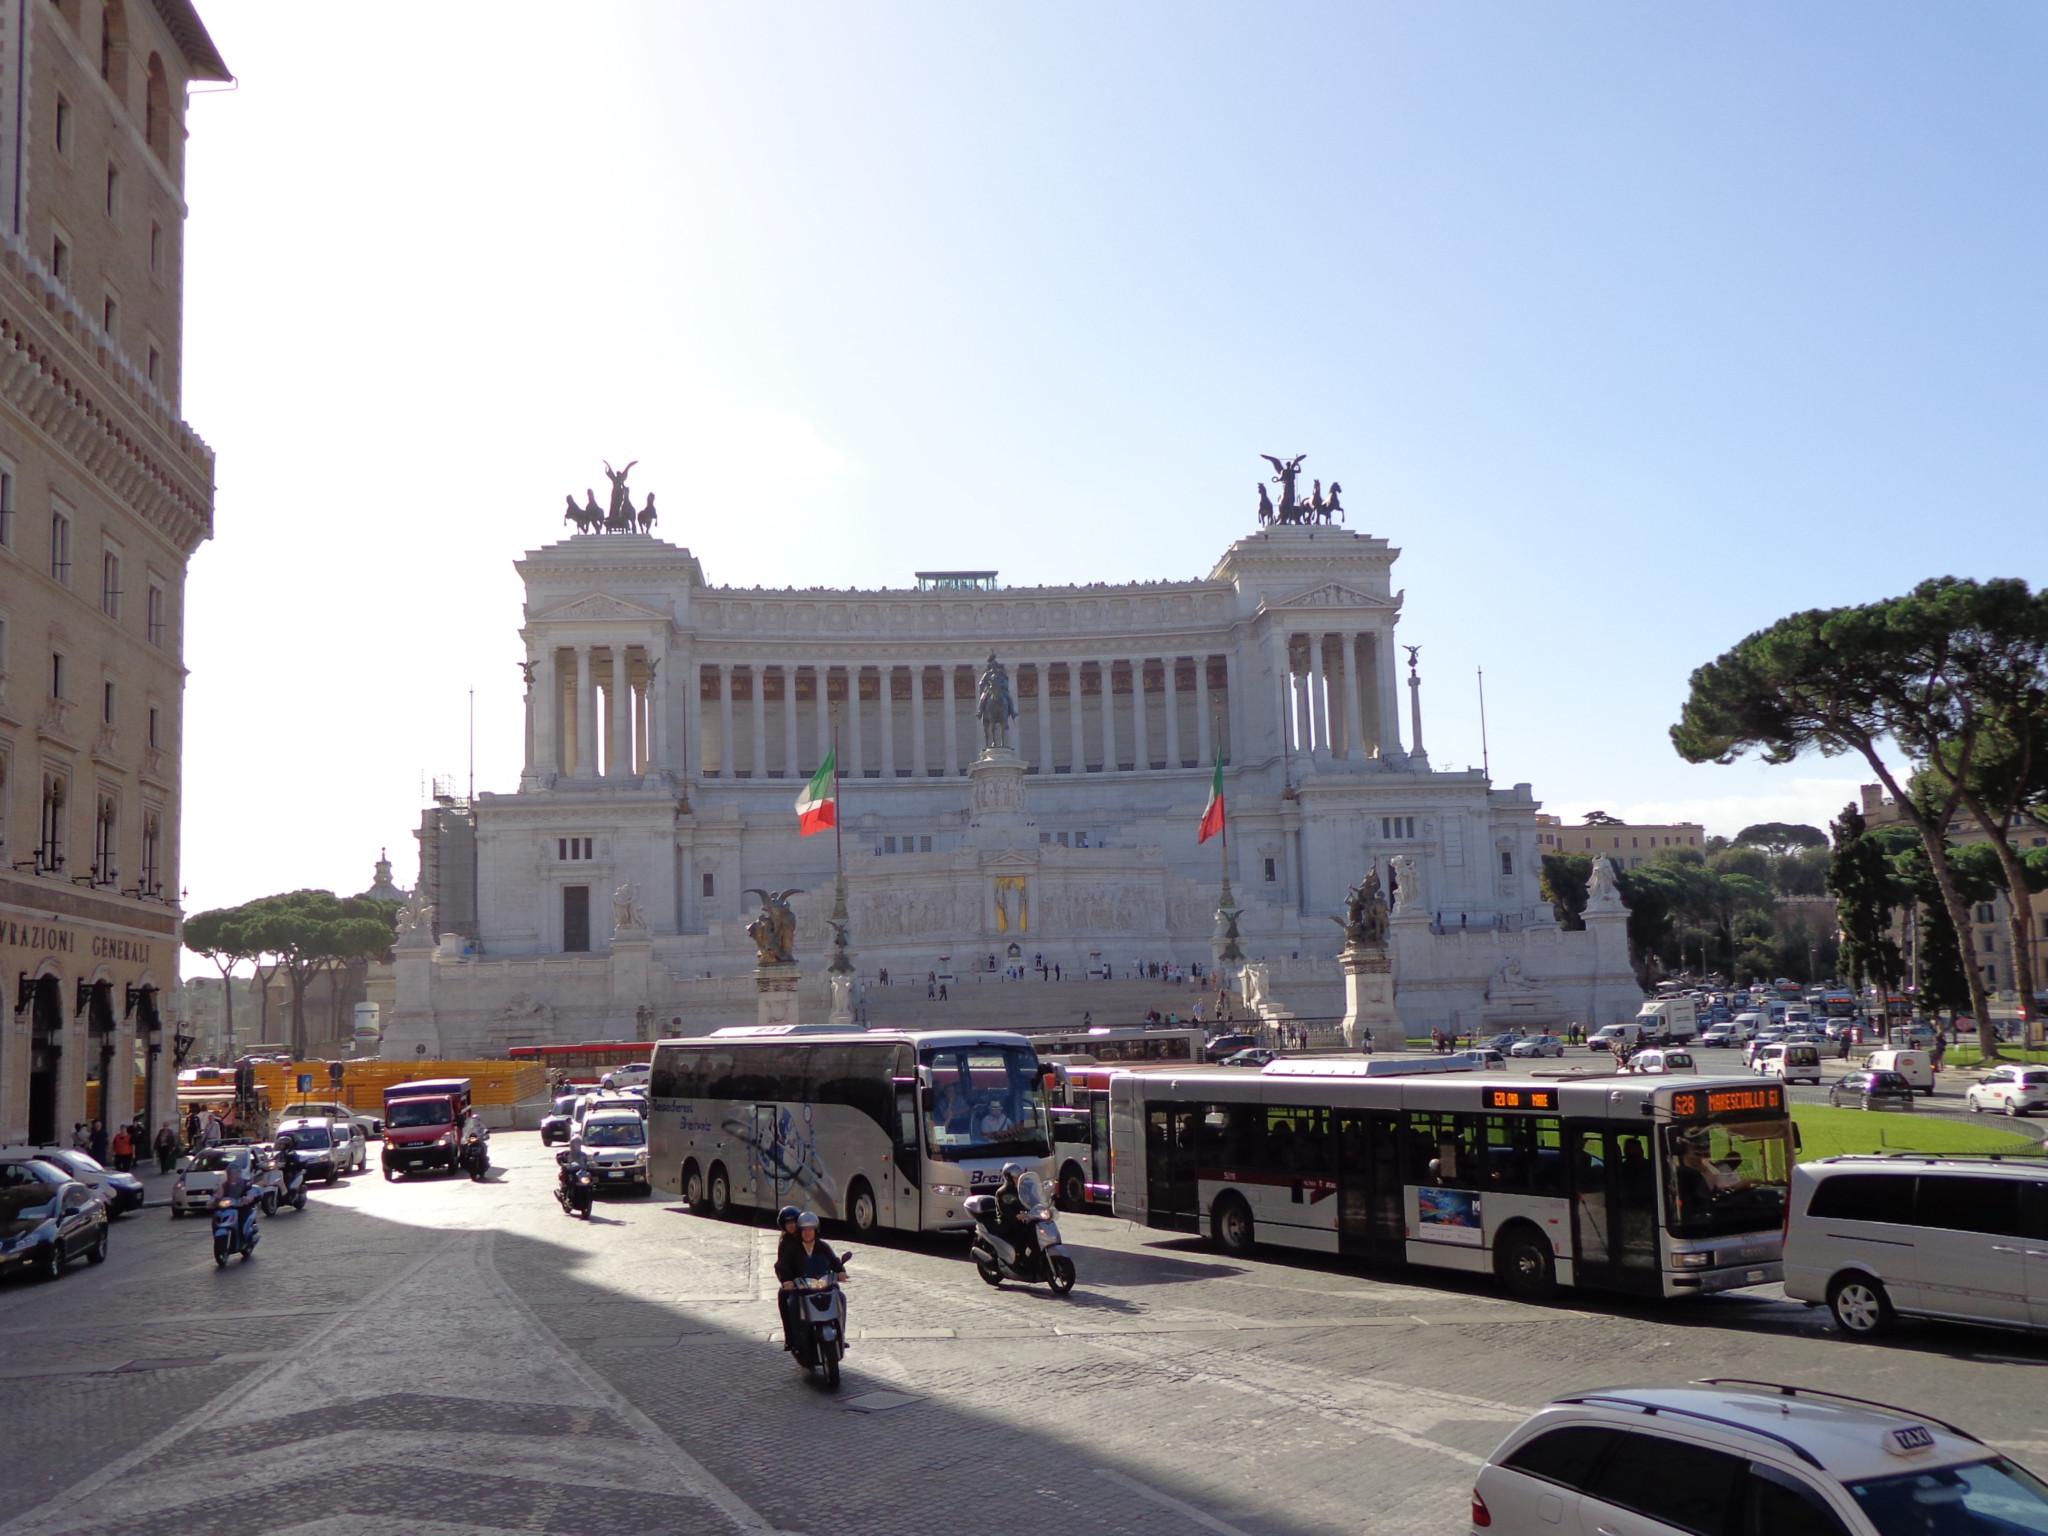 The Roman Capitol